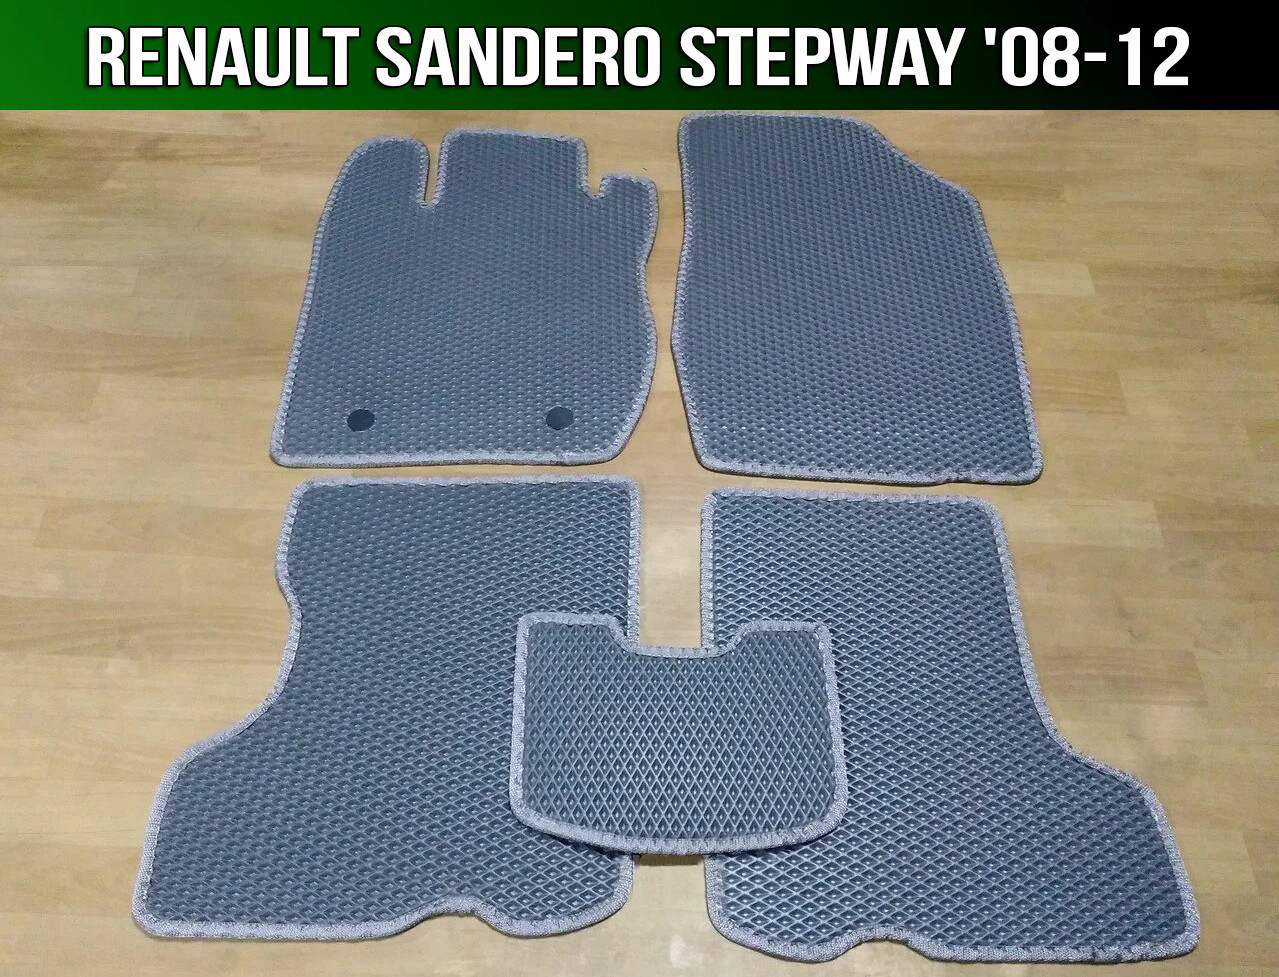 ЕВА коврики на Renault Sandero Stepway '08-12. Ковры EVA Рено Сандеро Степвей